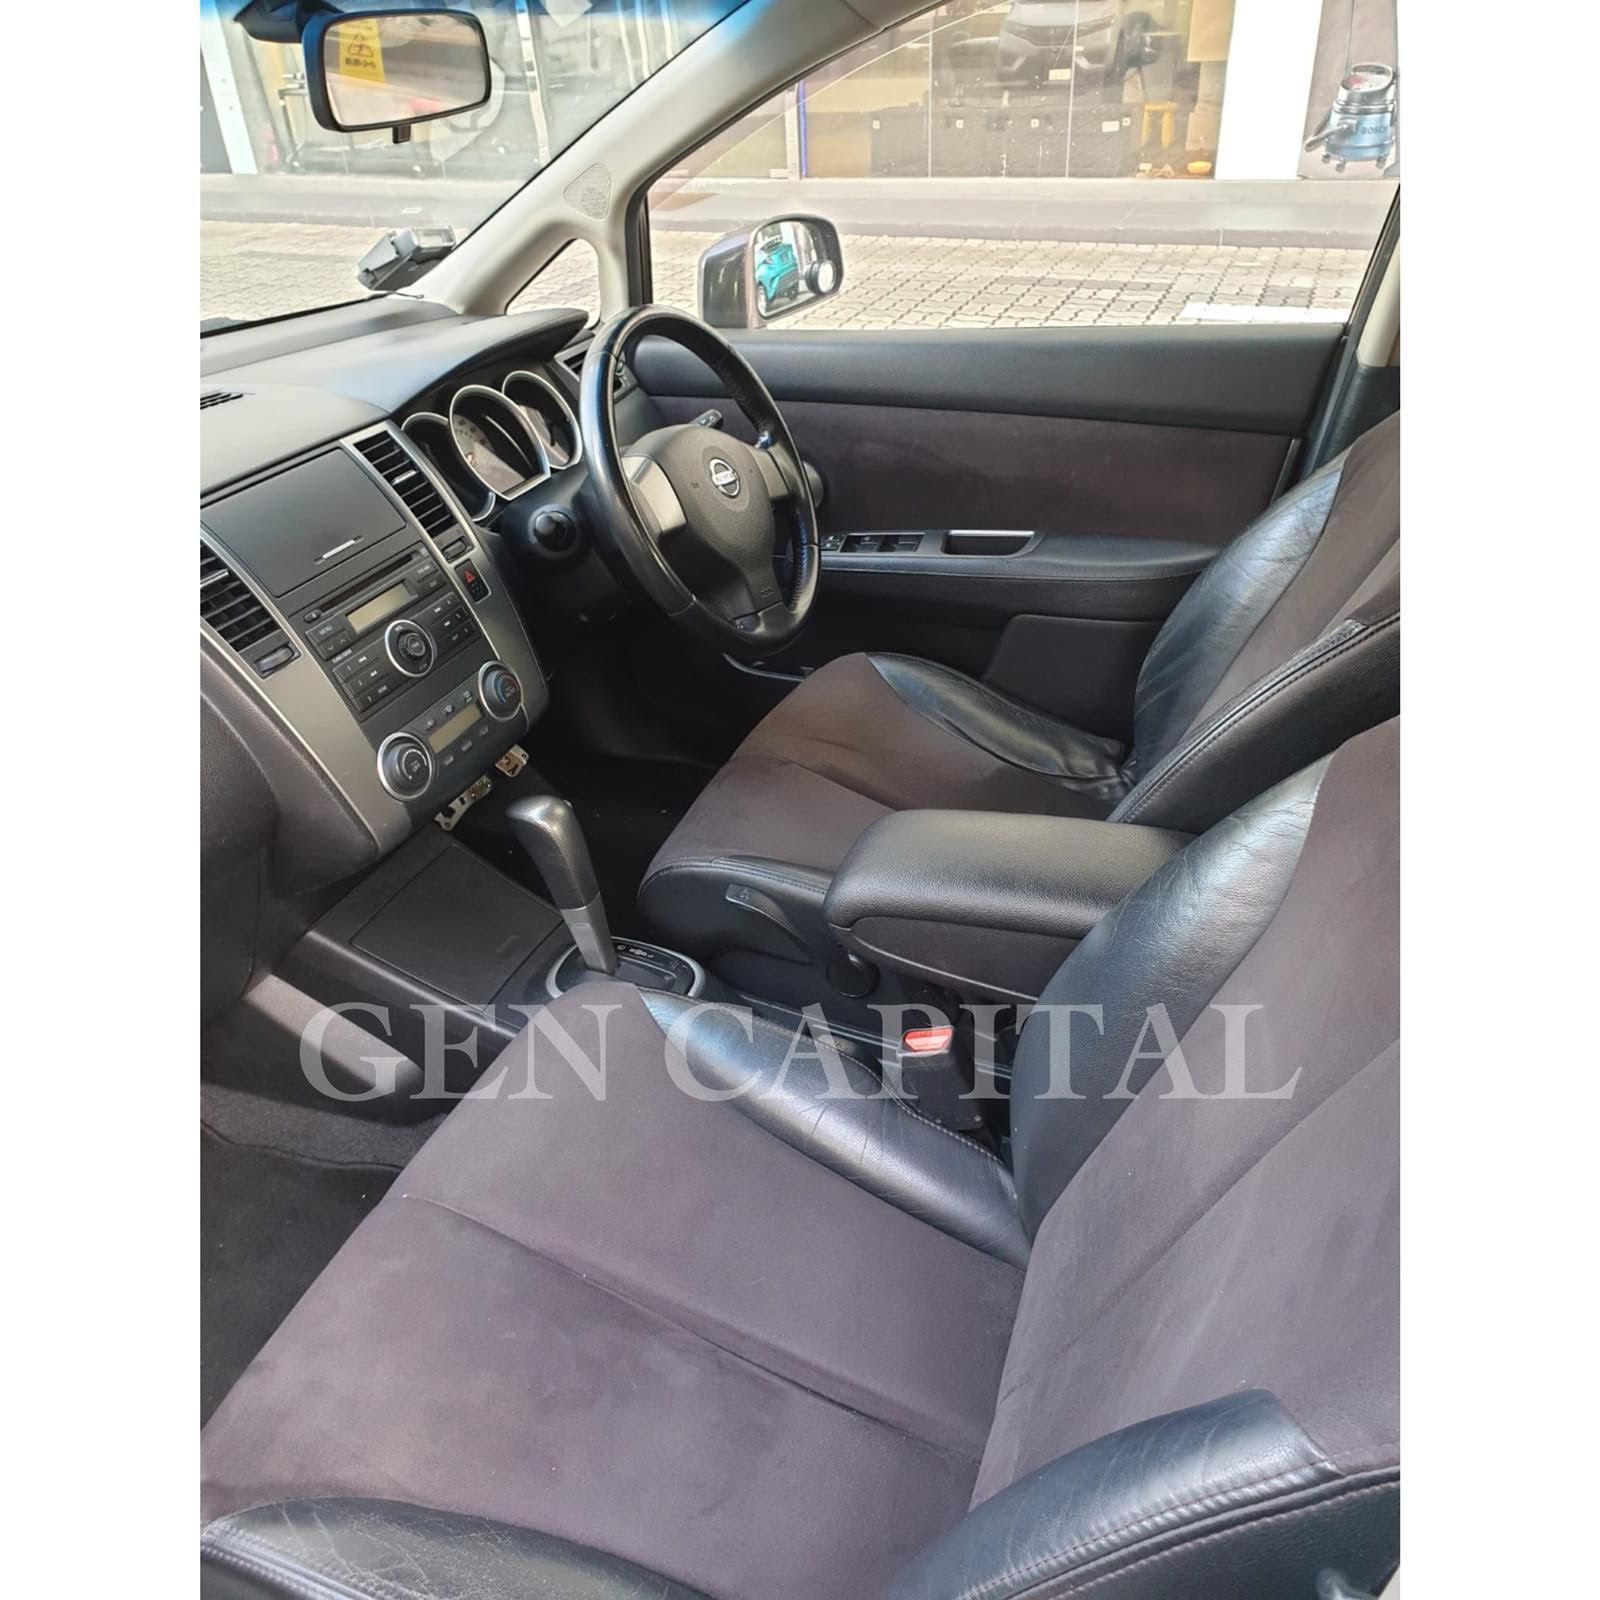 Nissan Latio 1.5A Grab Gojek Ryde Tada & Non PHV Car Rental